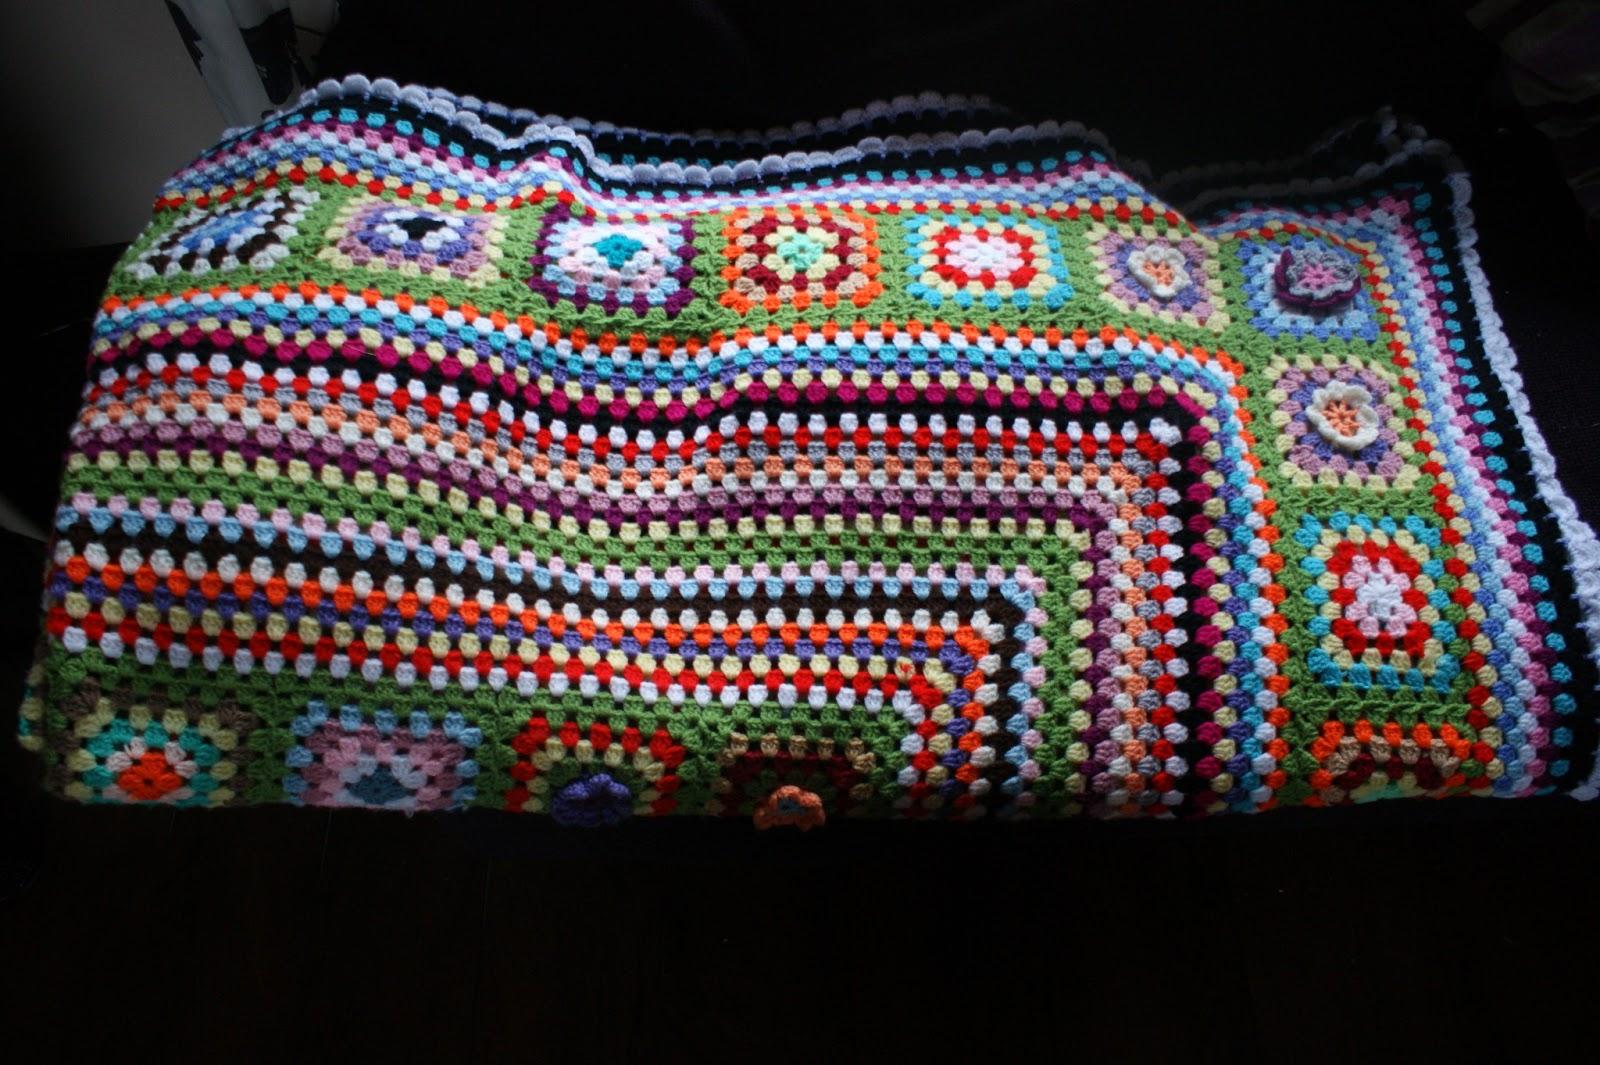 helen 39 s colourful crochet blankets latest king size crochet blanket. Black Bedroom Furniture Sets. Home Design Ideas